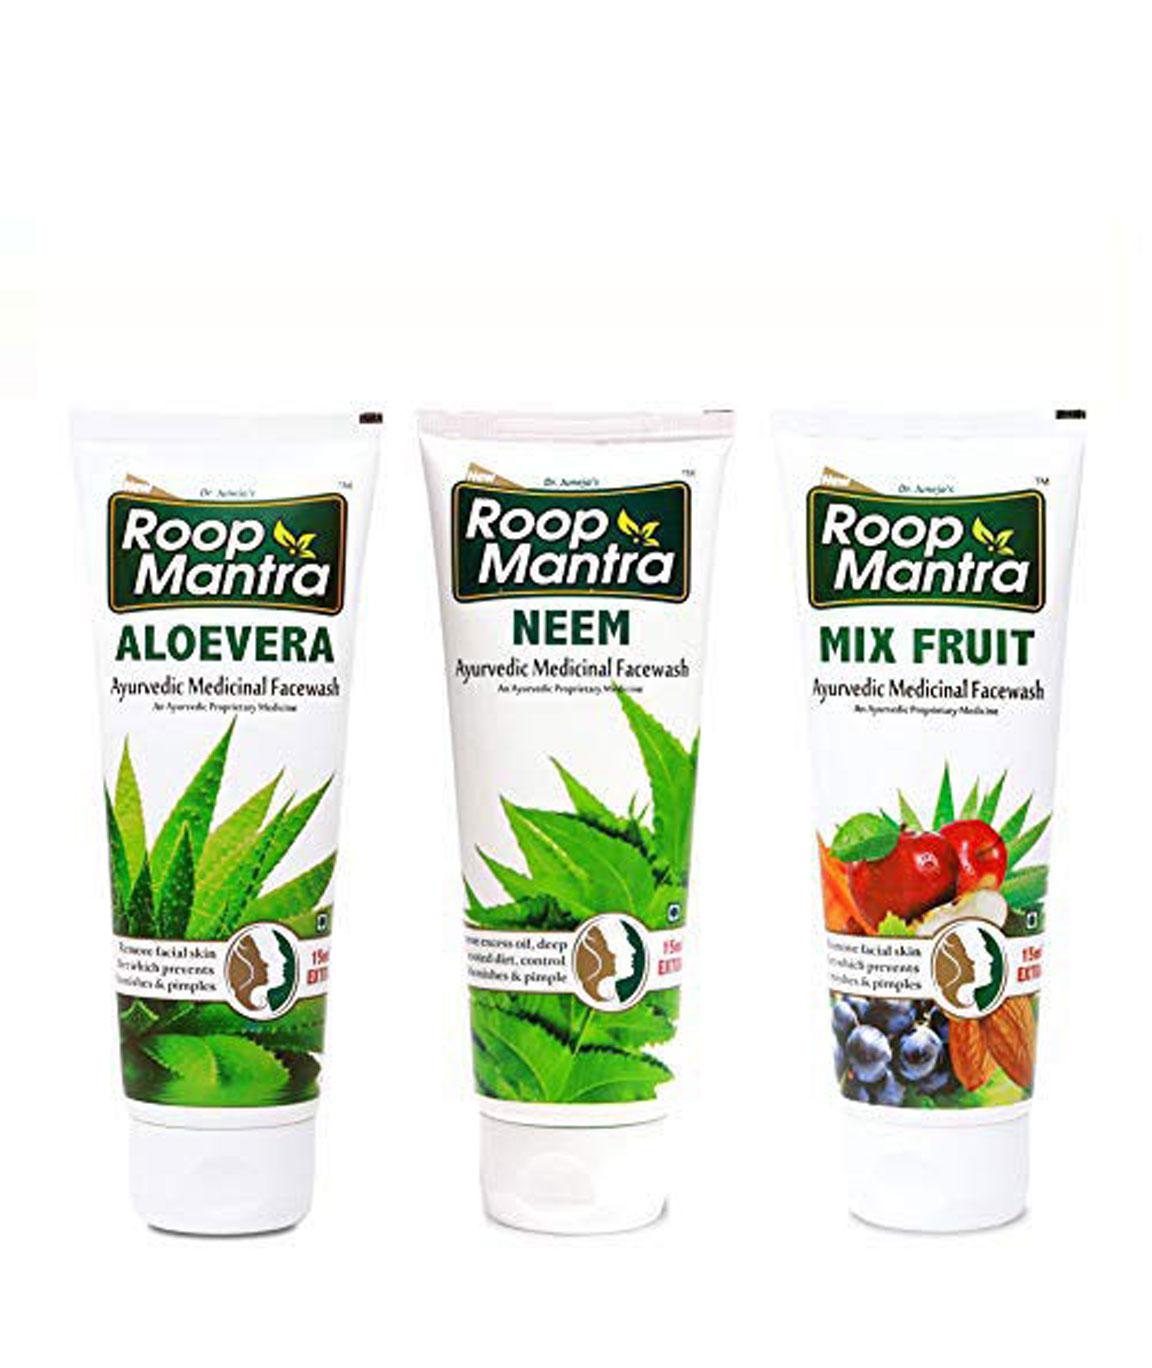 Roop Mantra Face Wash Combo for Men & Women (Aloevera Face Wash + Neem Face Wash + Mix Fruit Face Wash) - 115ml X 3pcs